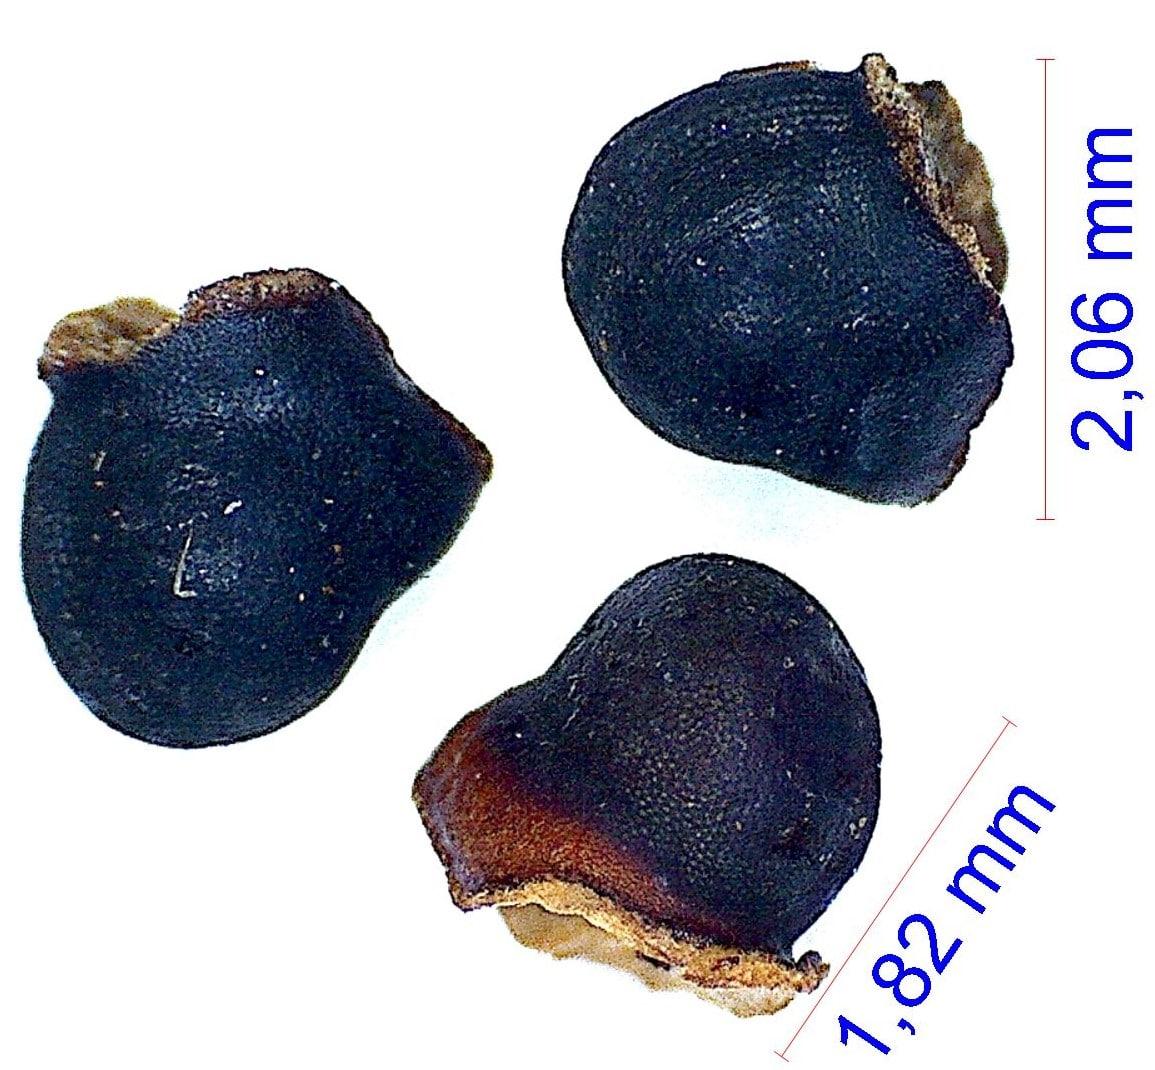 Gymnocalycium hyptiacanthum ssp uruguayensis v. roseiflorum. © Joël Lodé/cactus-aventures.com